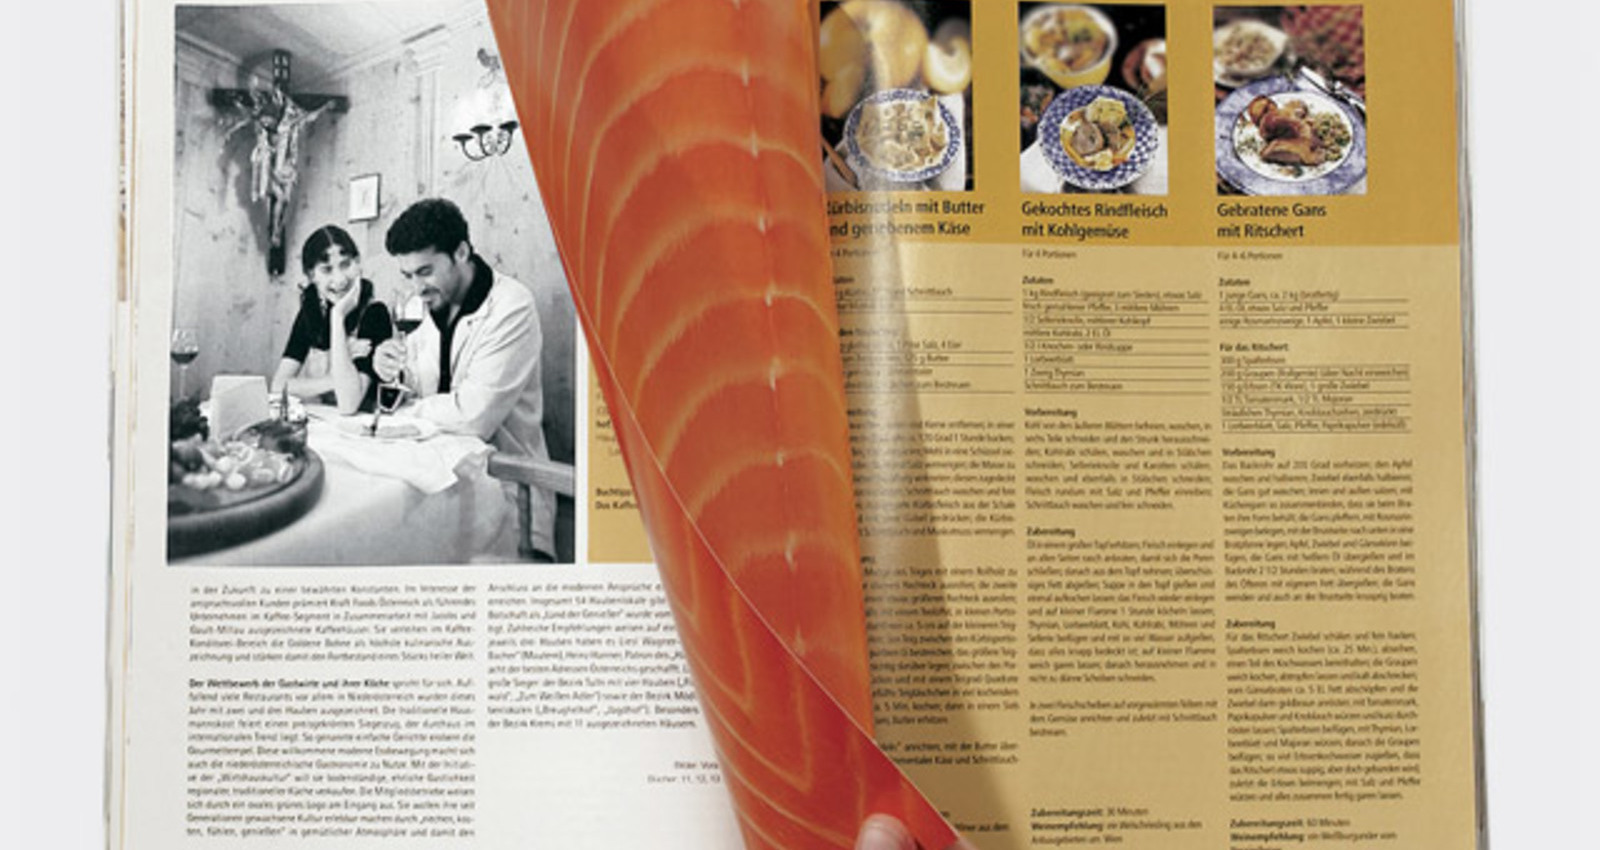 Ham, Salmon, Cheesequote